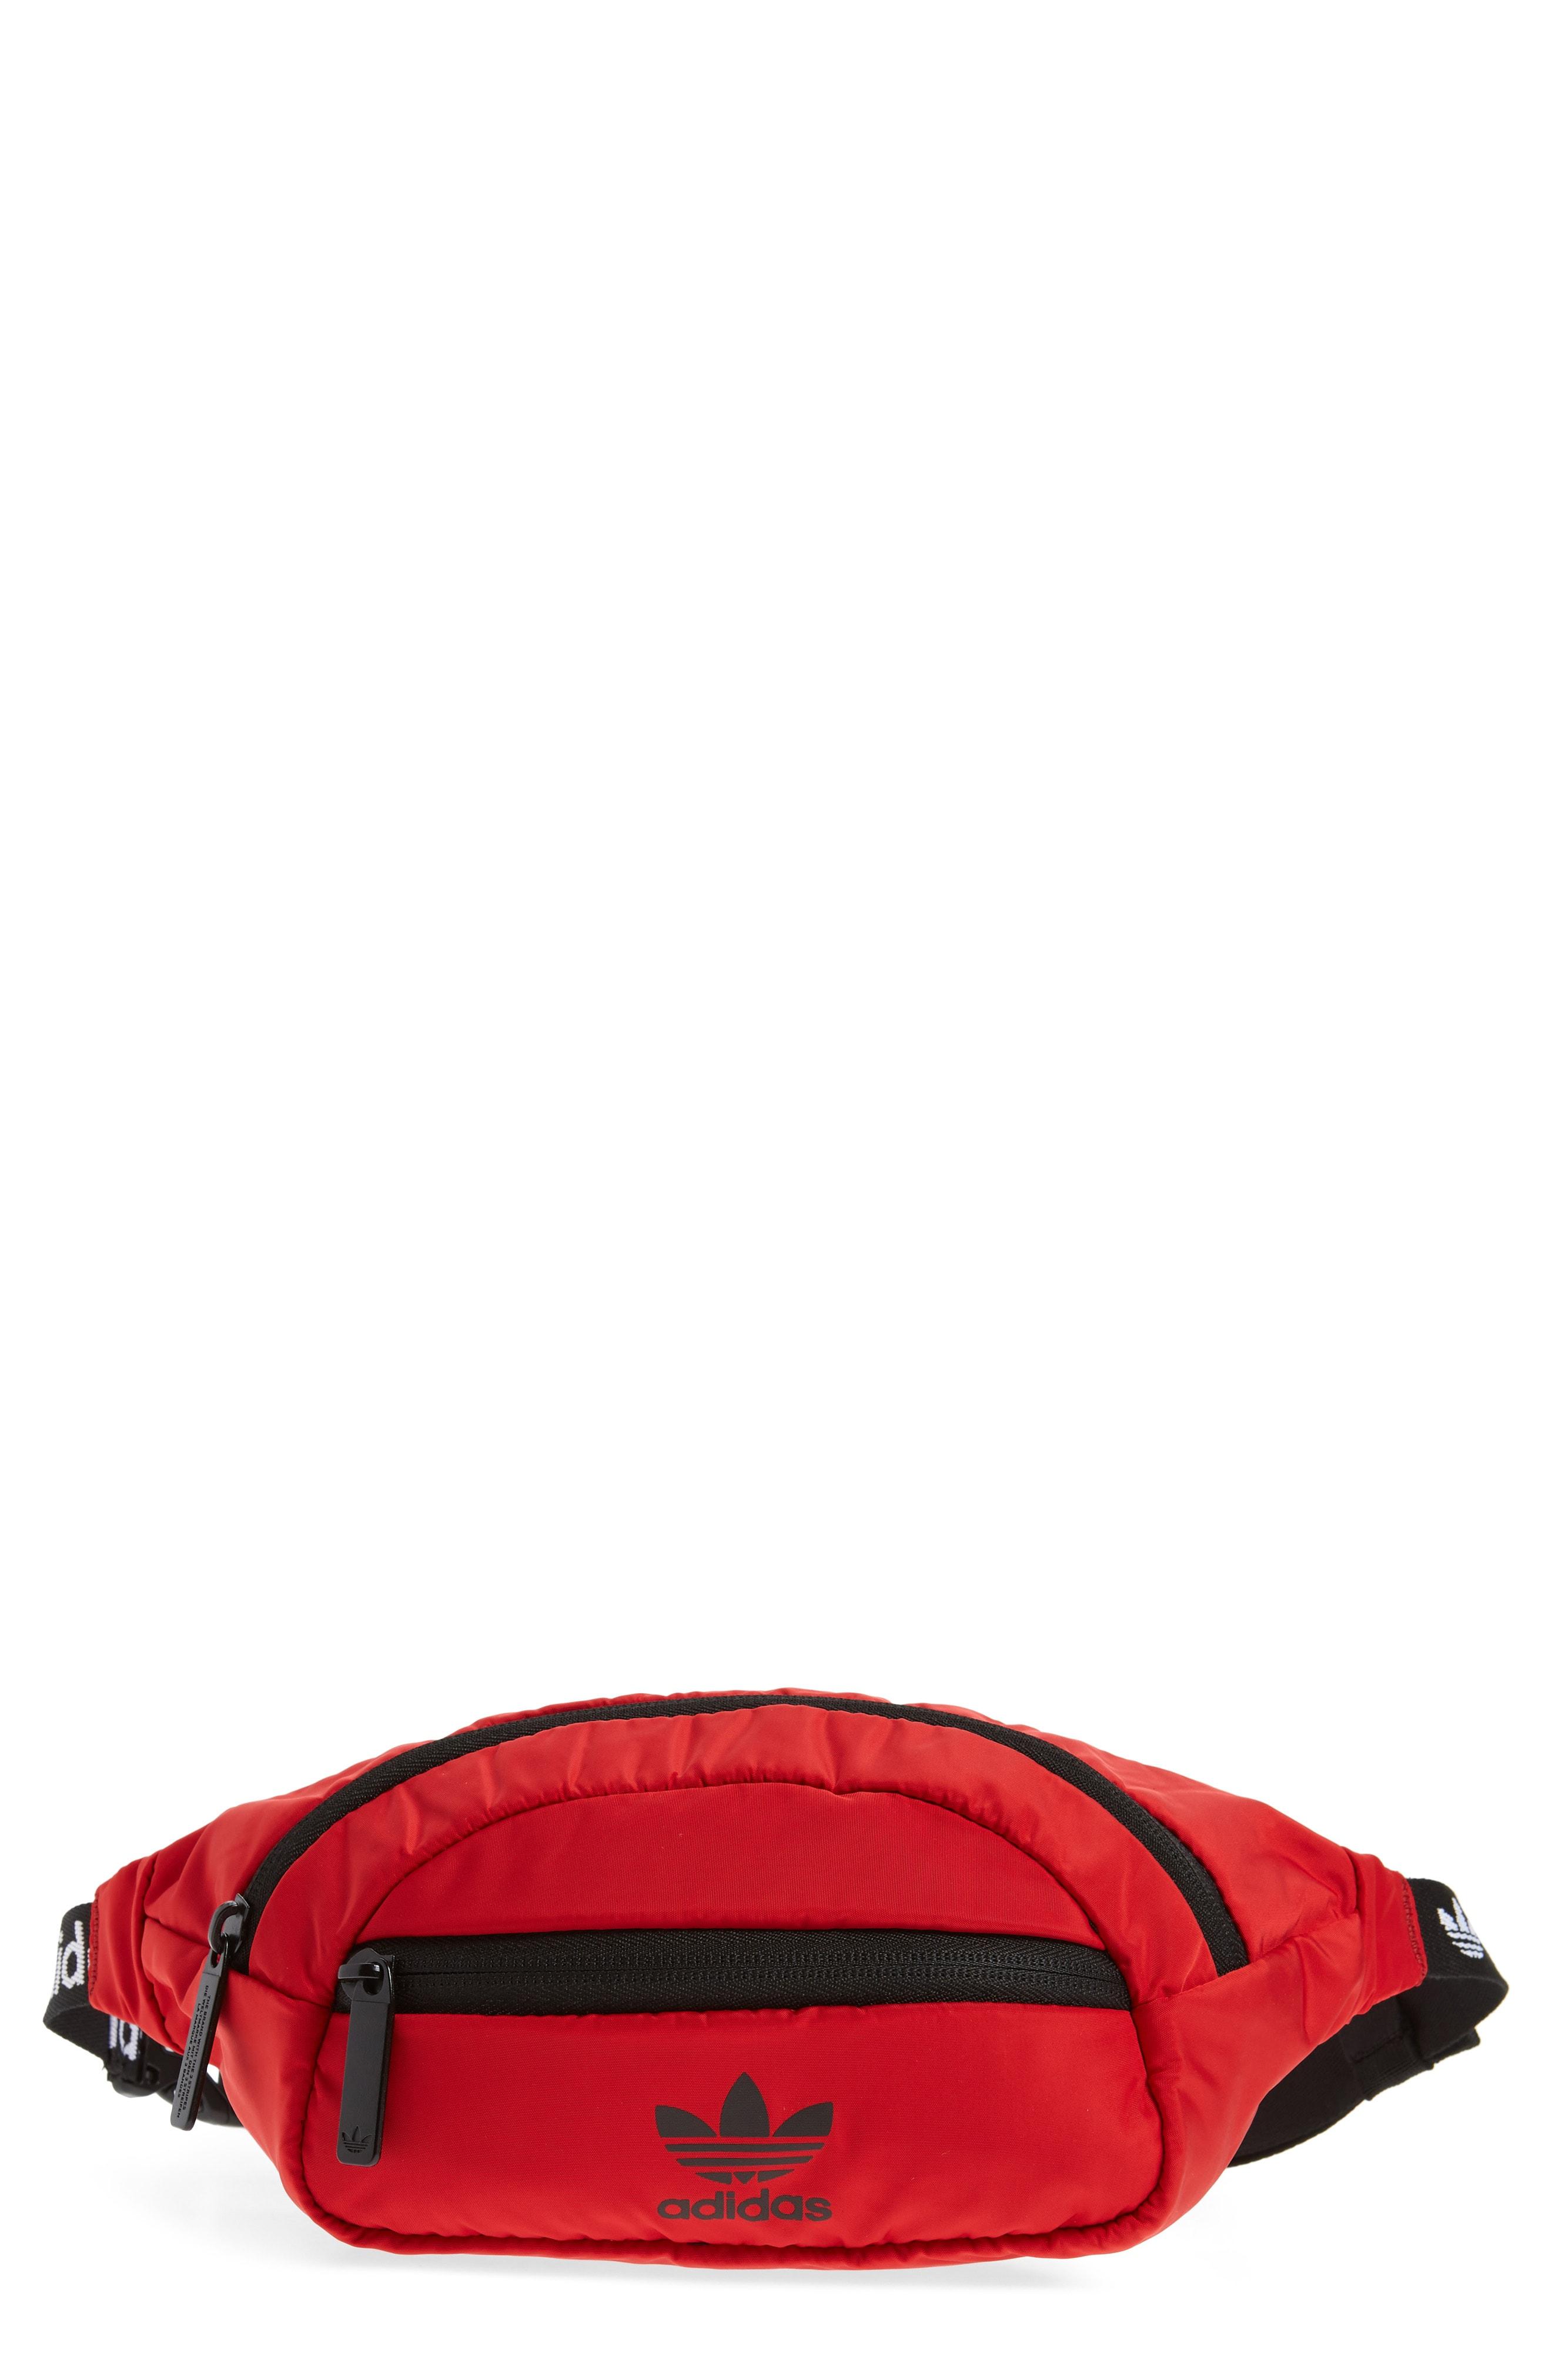 adidas Originals National Belt Bag